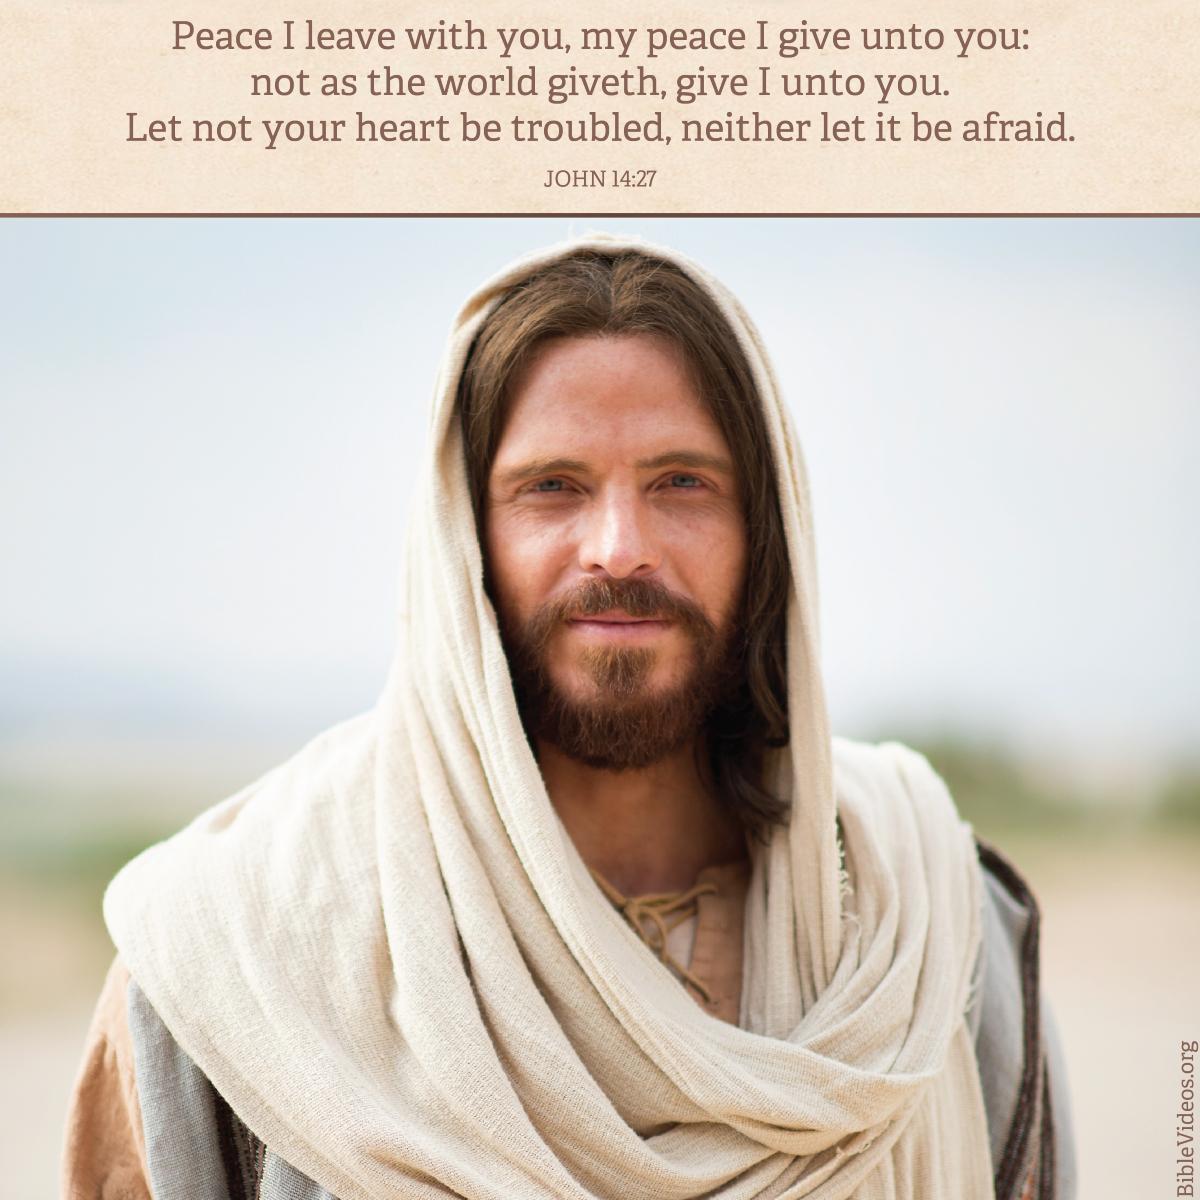 #ldsconf Odyssey: Peace